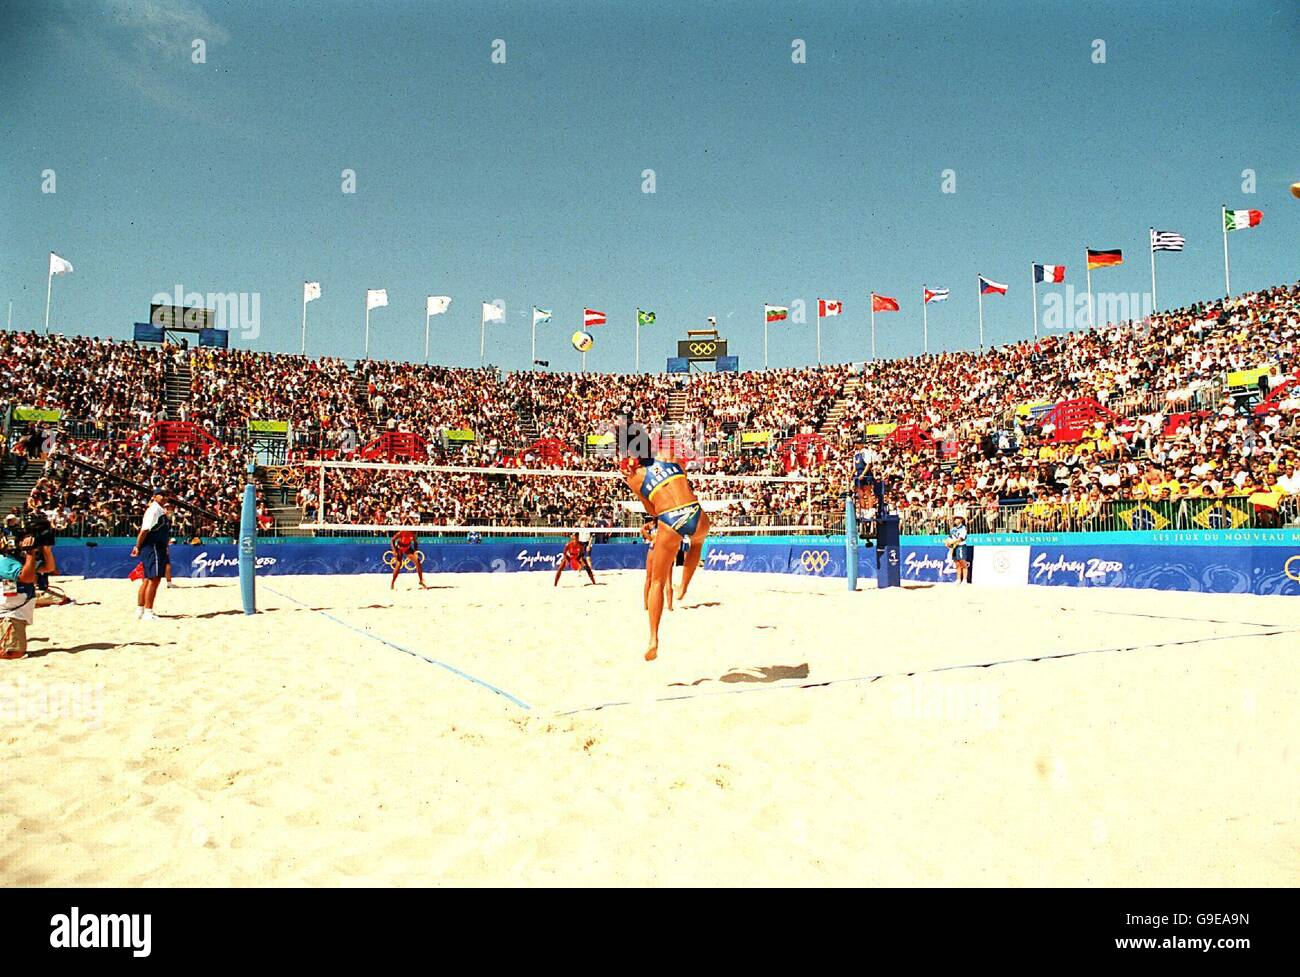 Sydney 2000 Olympics Women S Beach Volleyball Brazil V Cuba Stock Photo Alamy